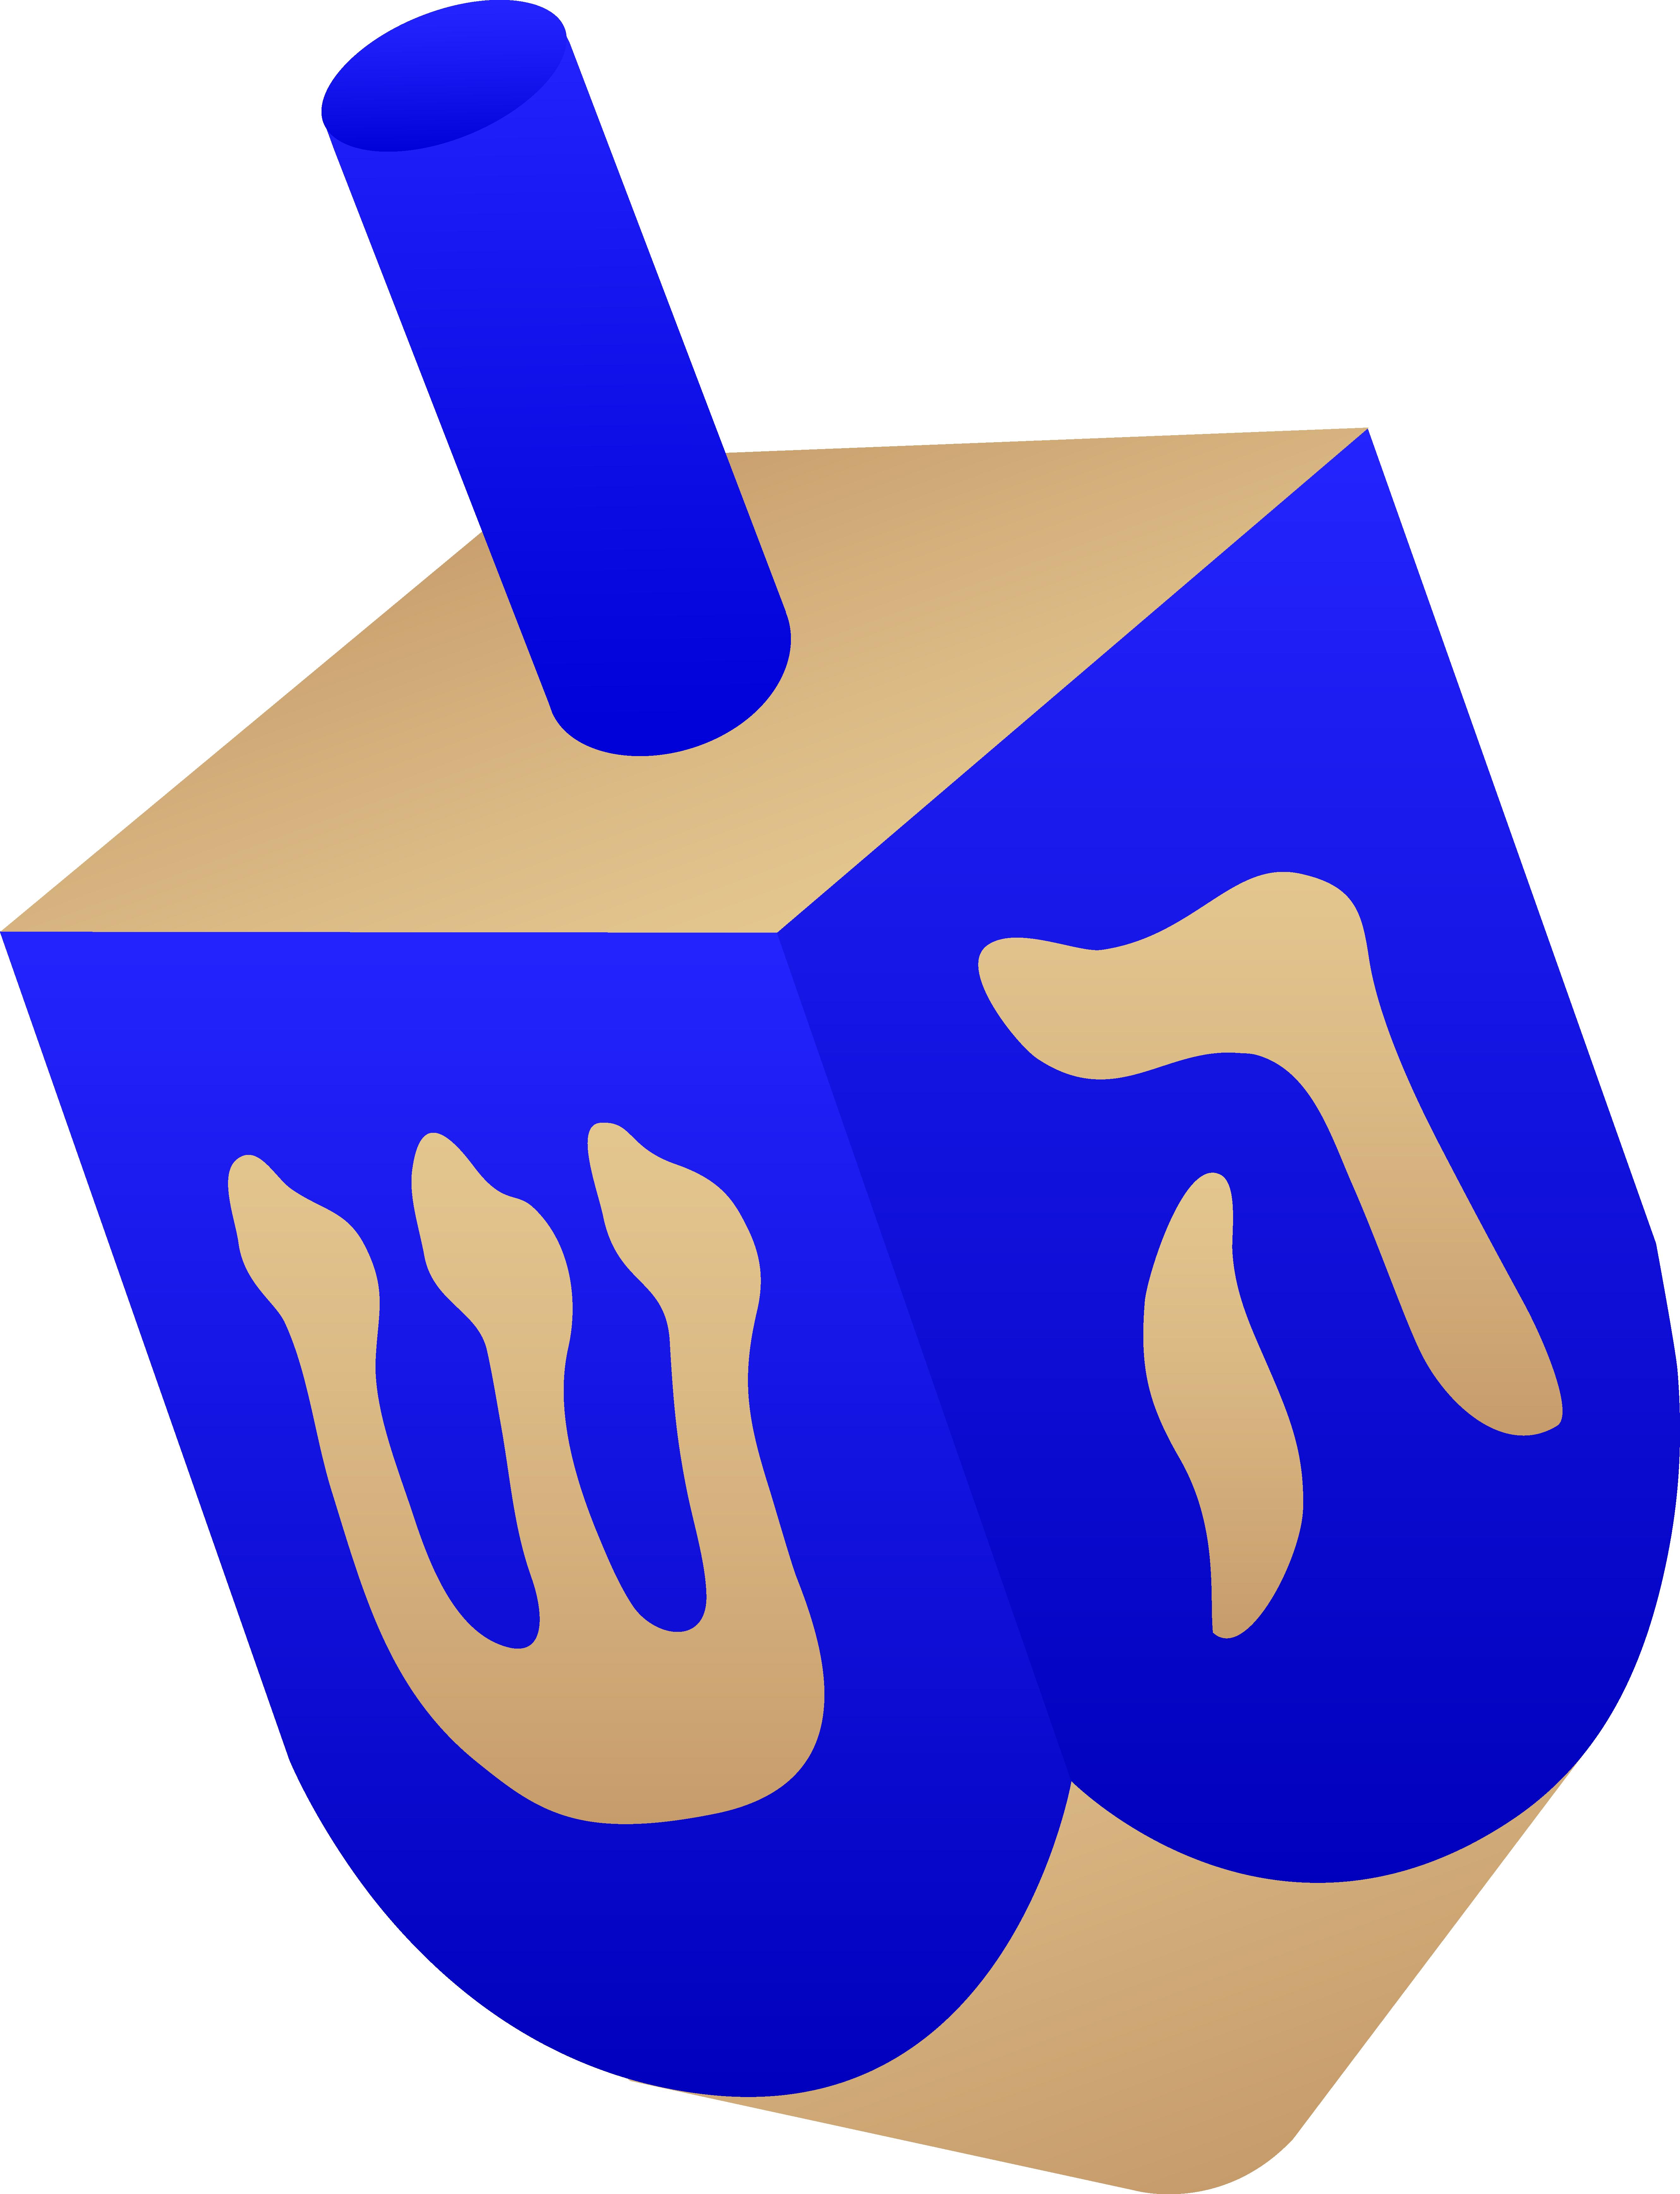 Free Jewish Symbols Pictures, Download Free Clip Art, Free.